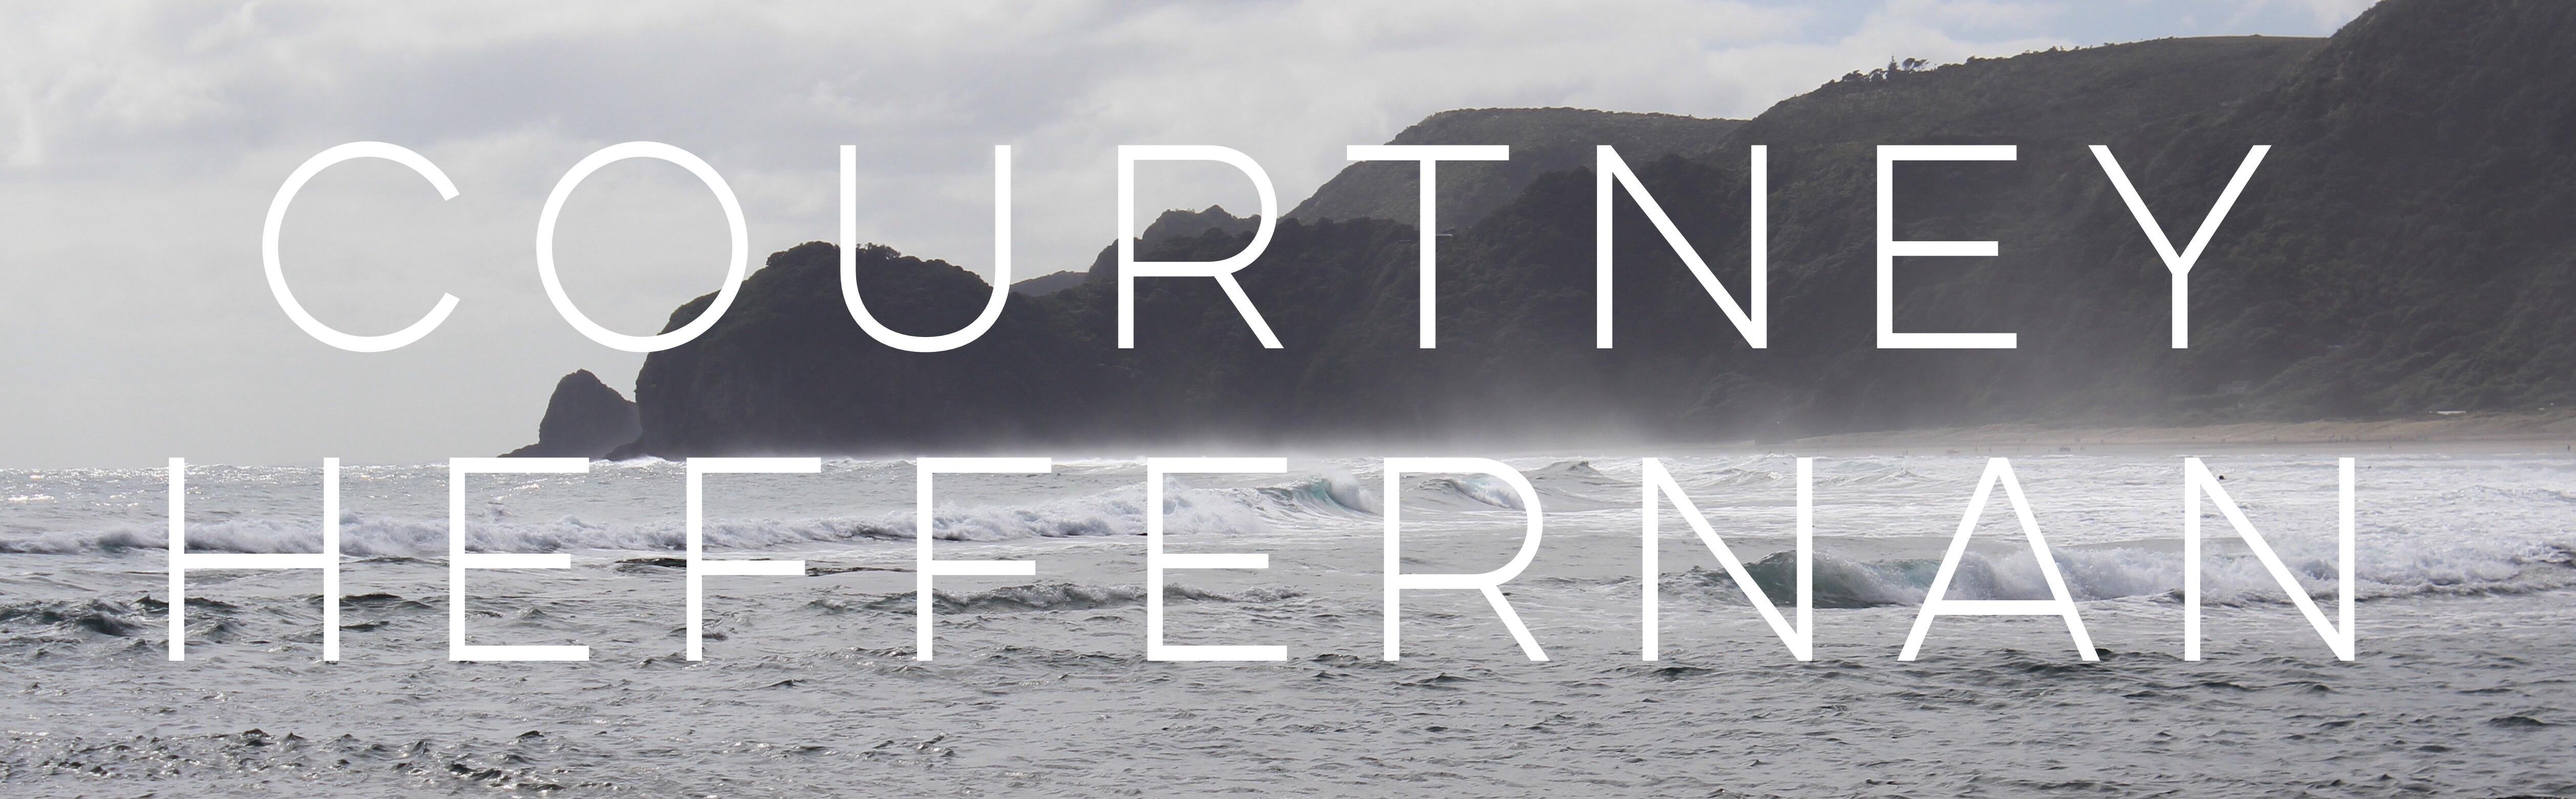 Courtney Heffernan blog header image